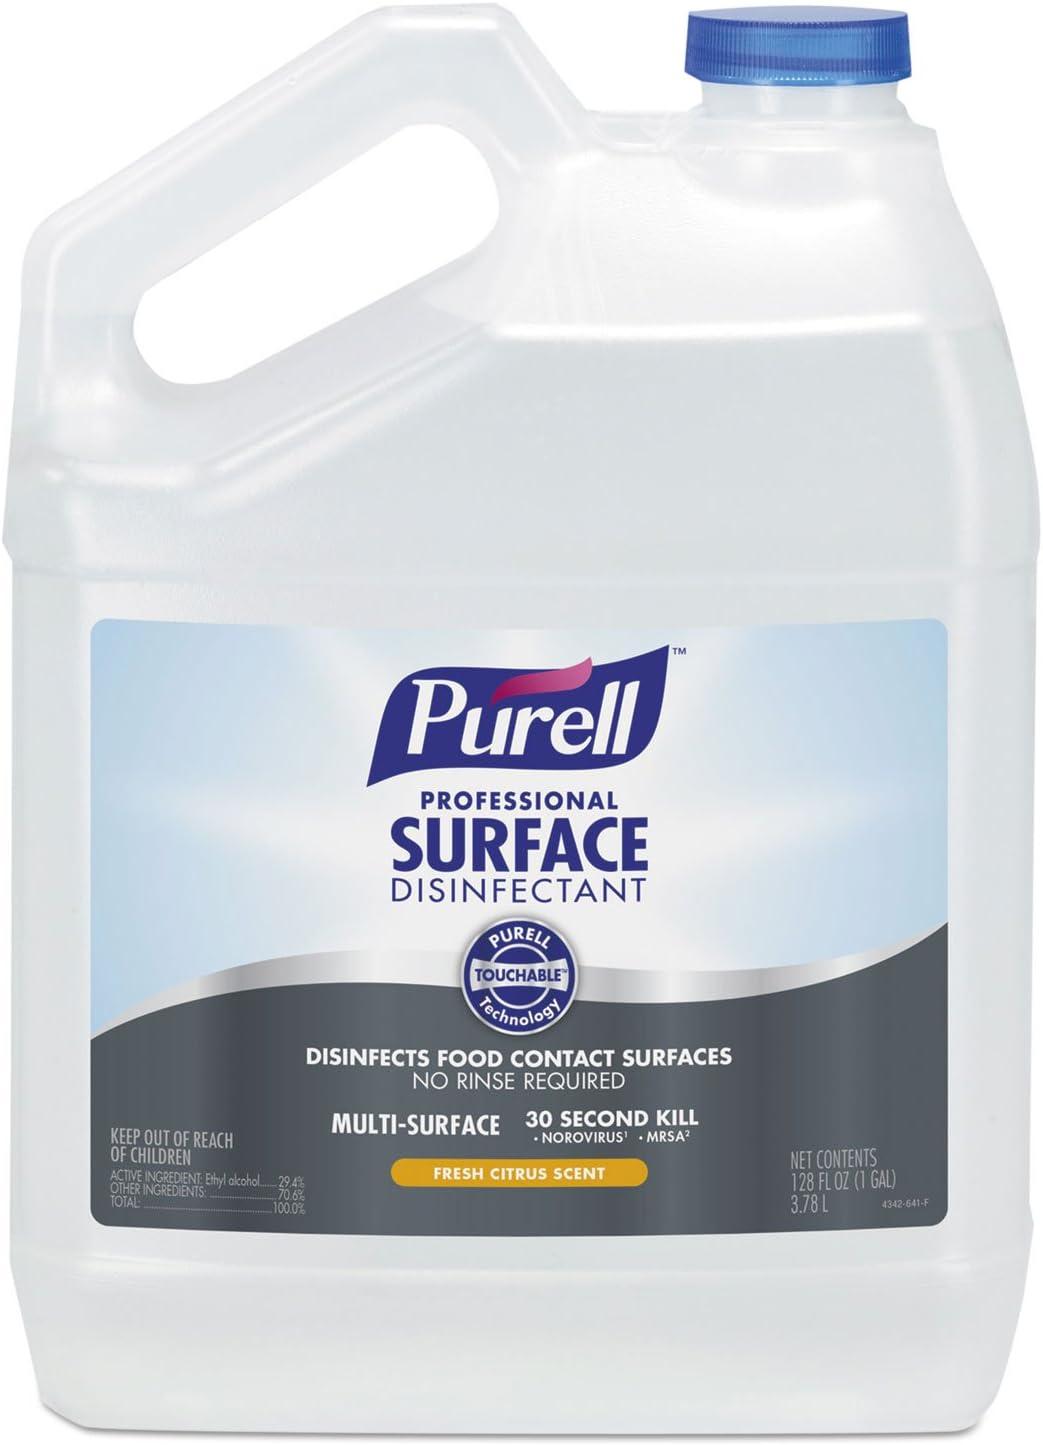 PURELL 434204EA Professional Surface Disinfectant, Fresh Citrus, 1 gal Bottle